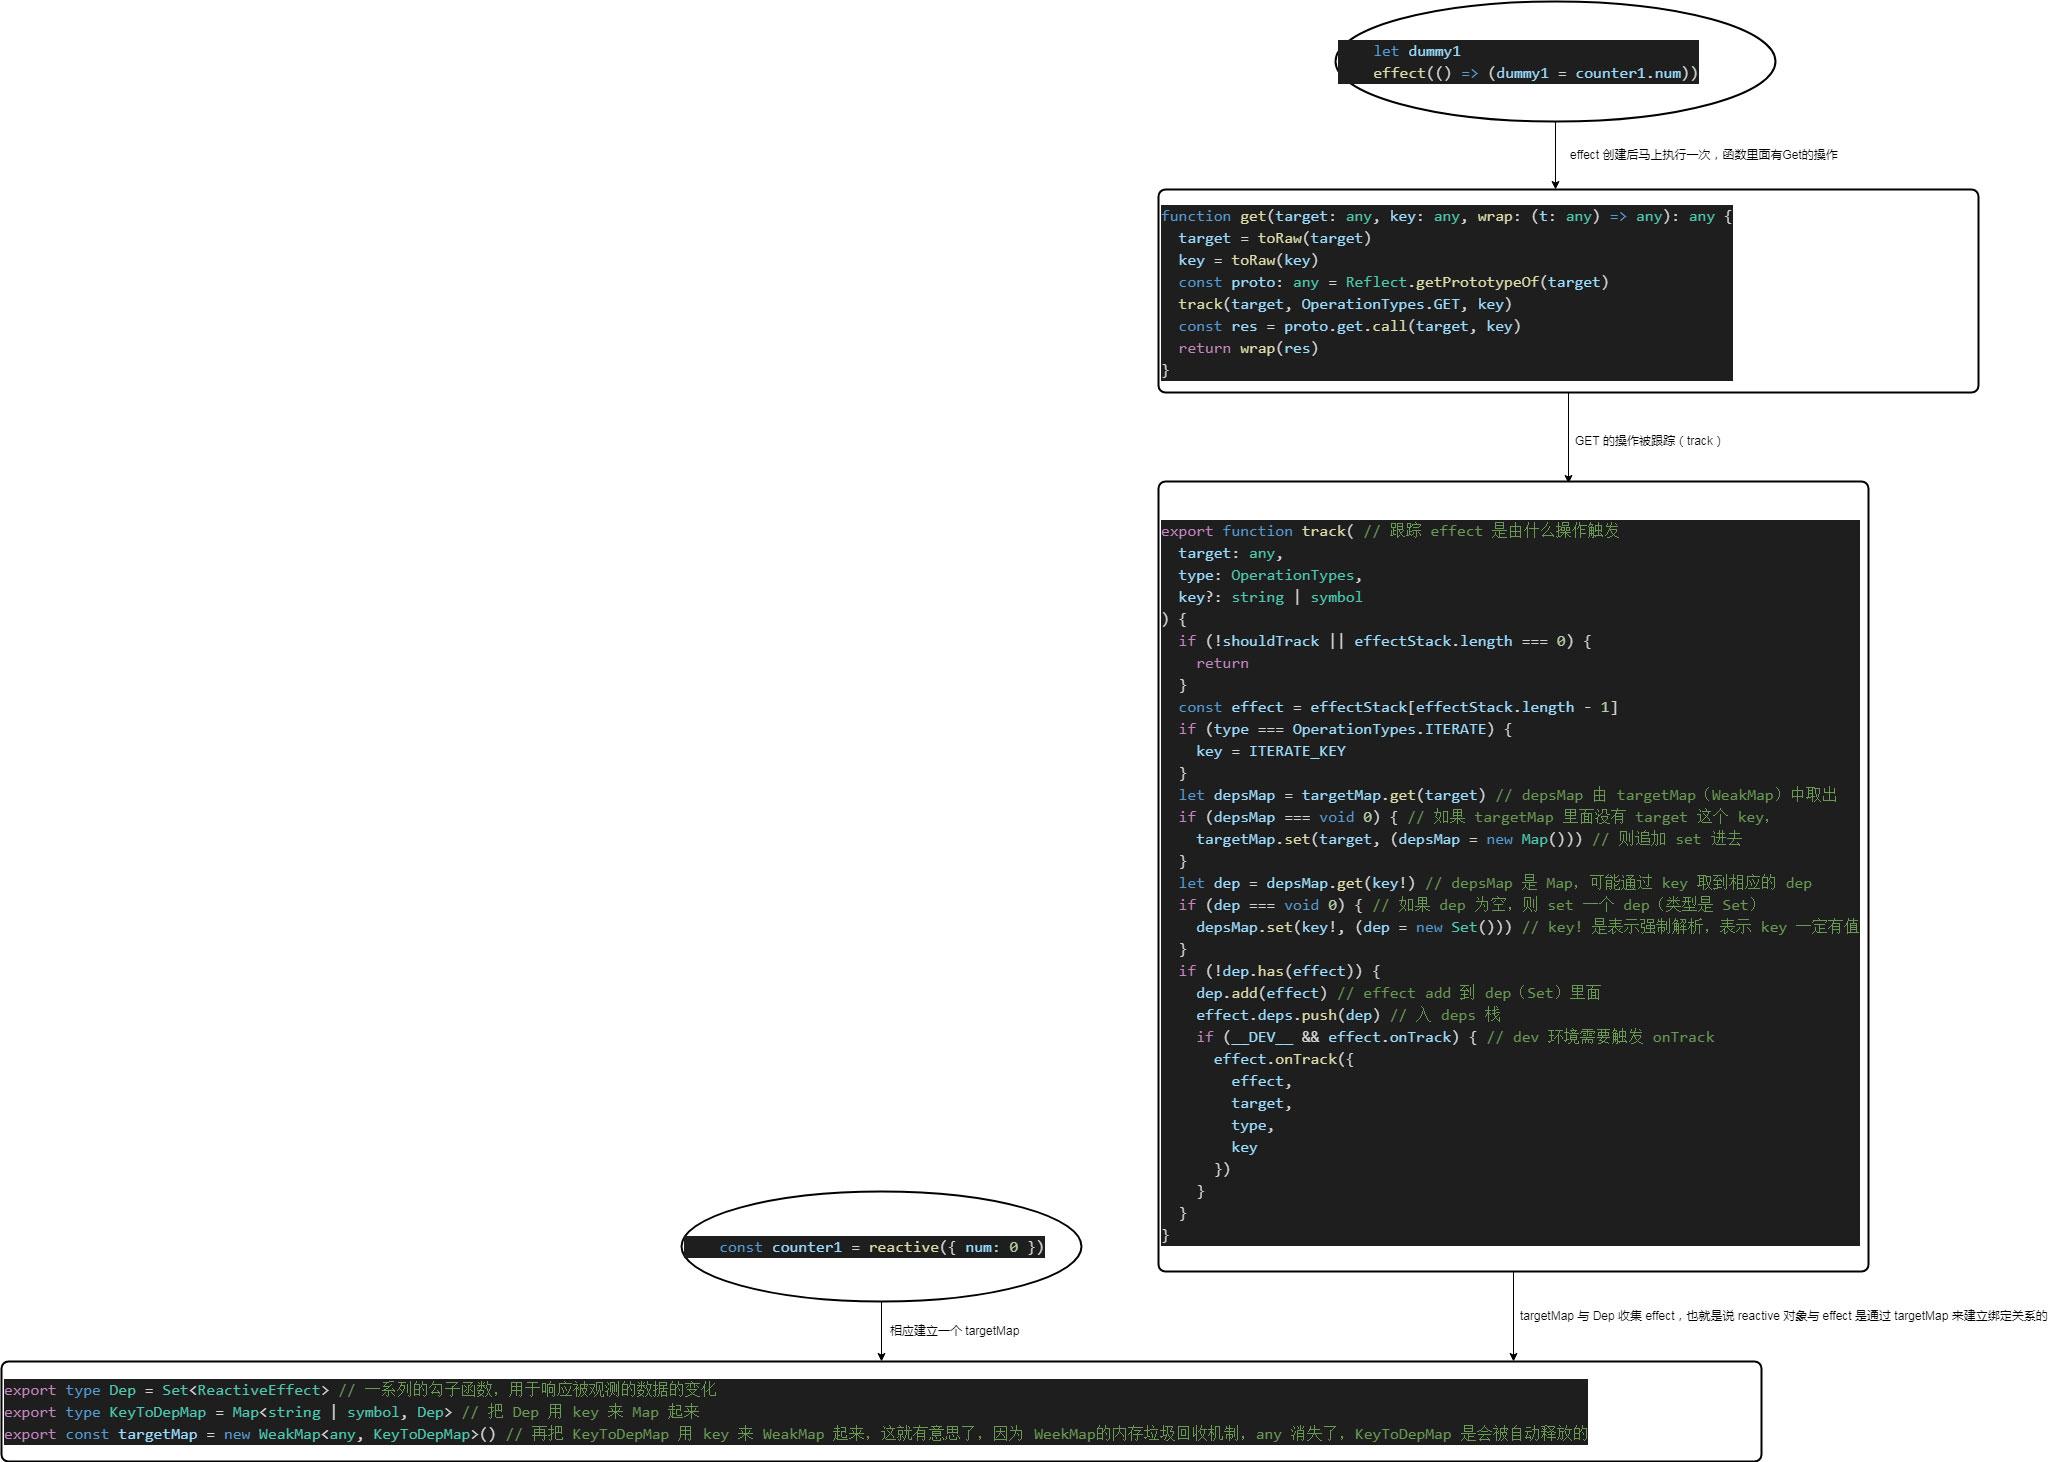 reactive-对象与-effect-是通过-targetMap-来建立绑定关系的